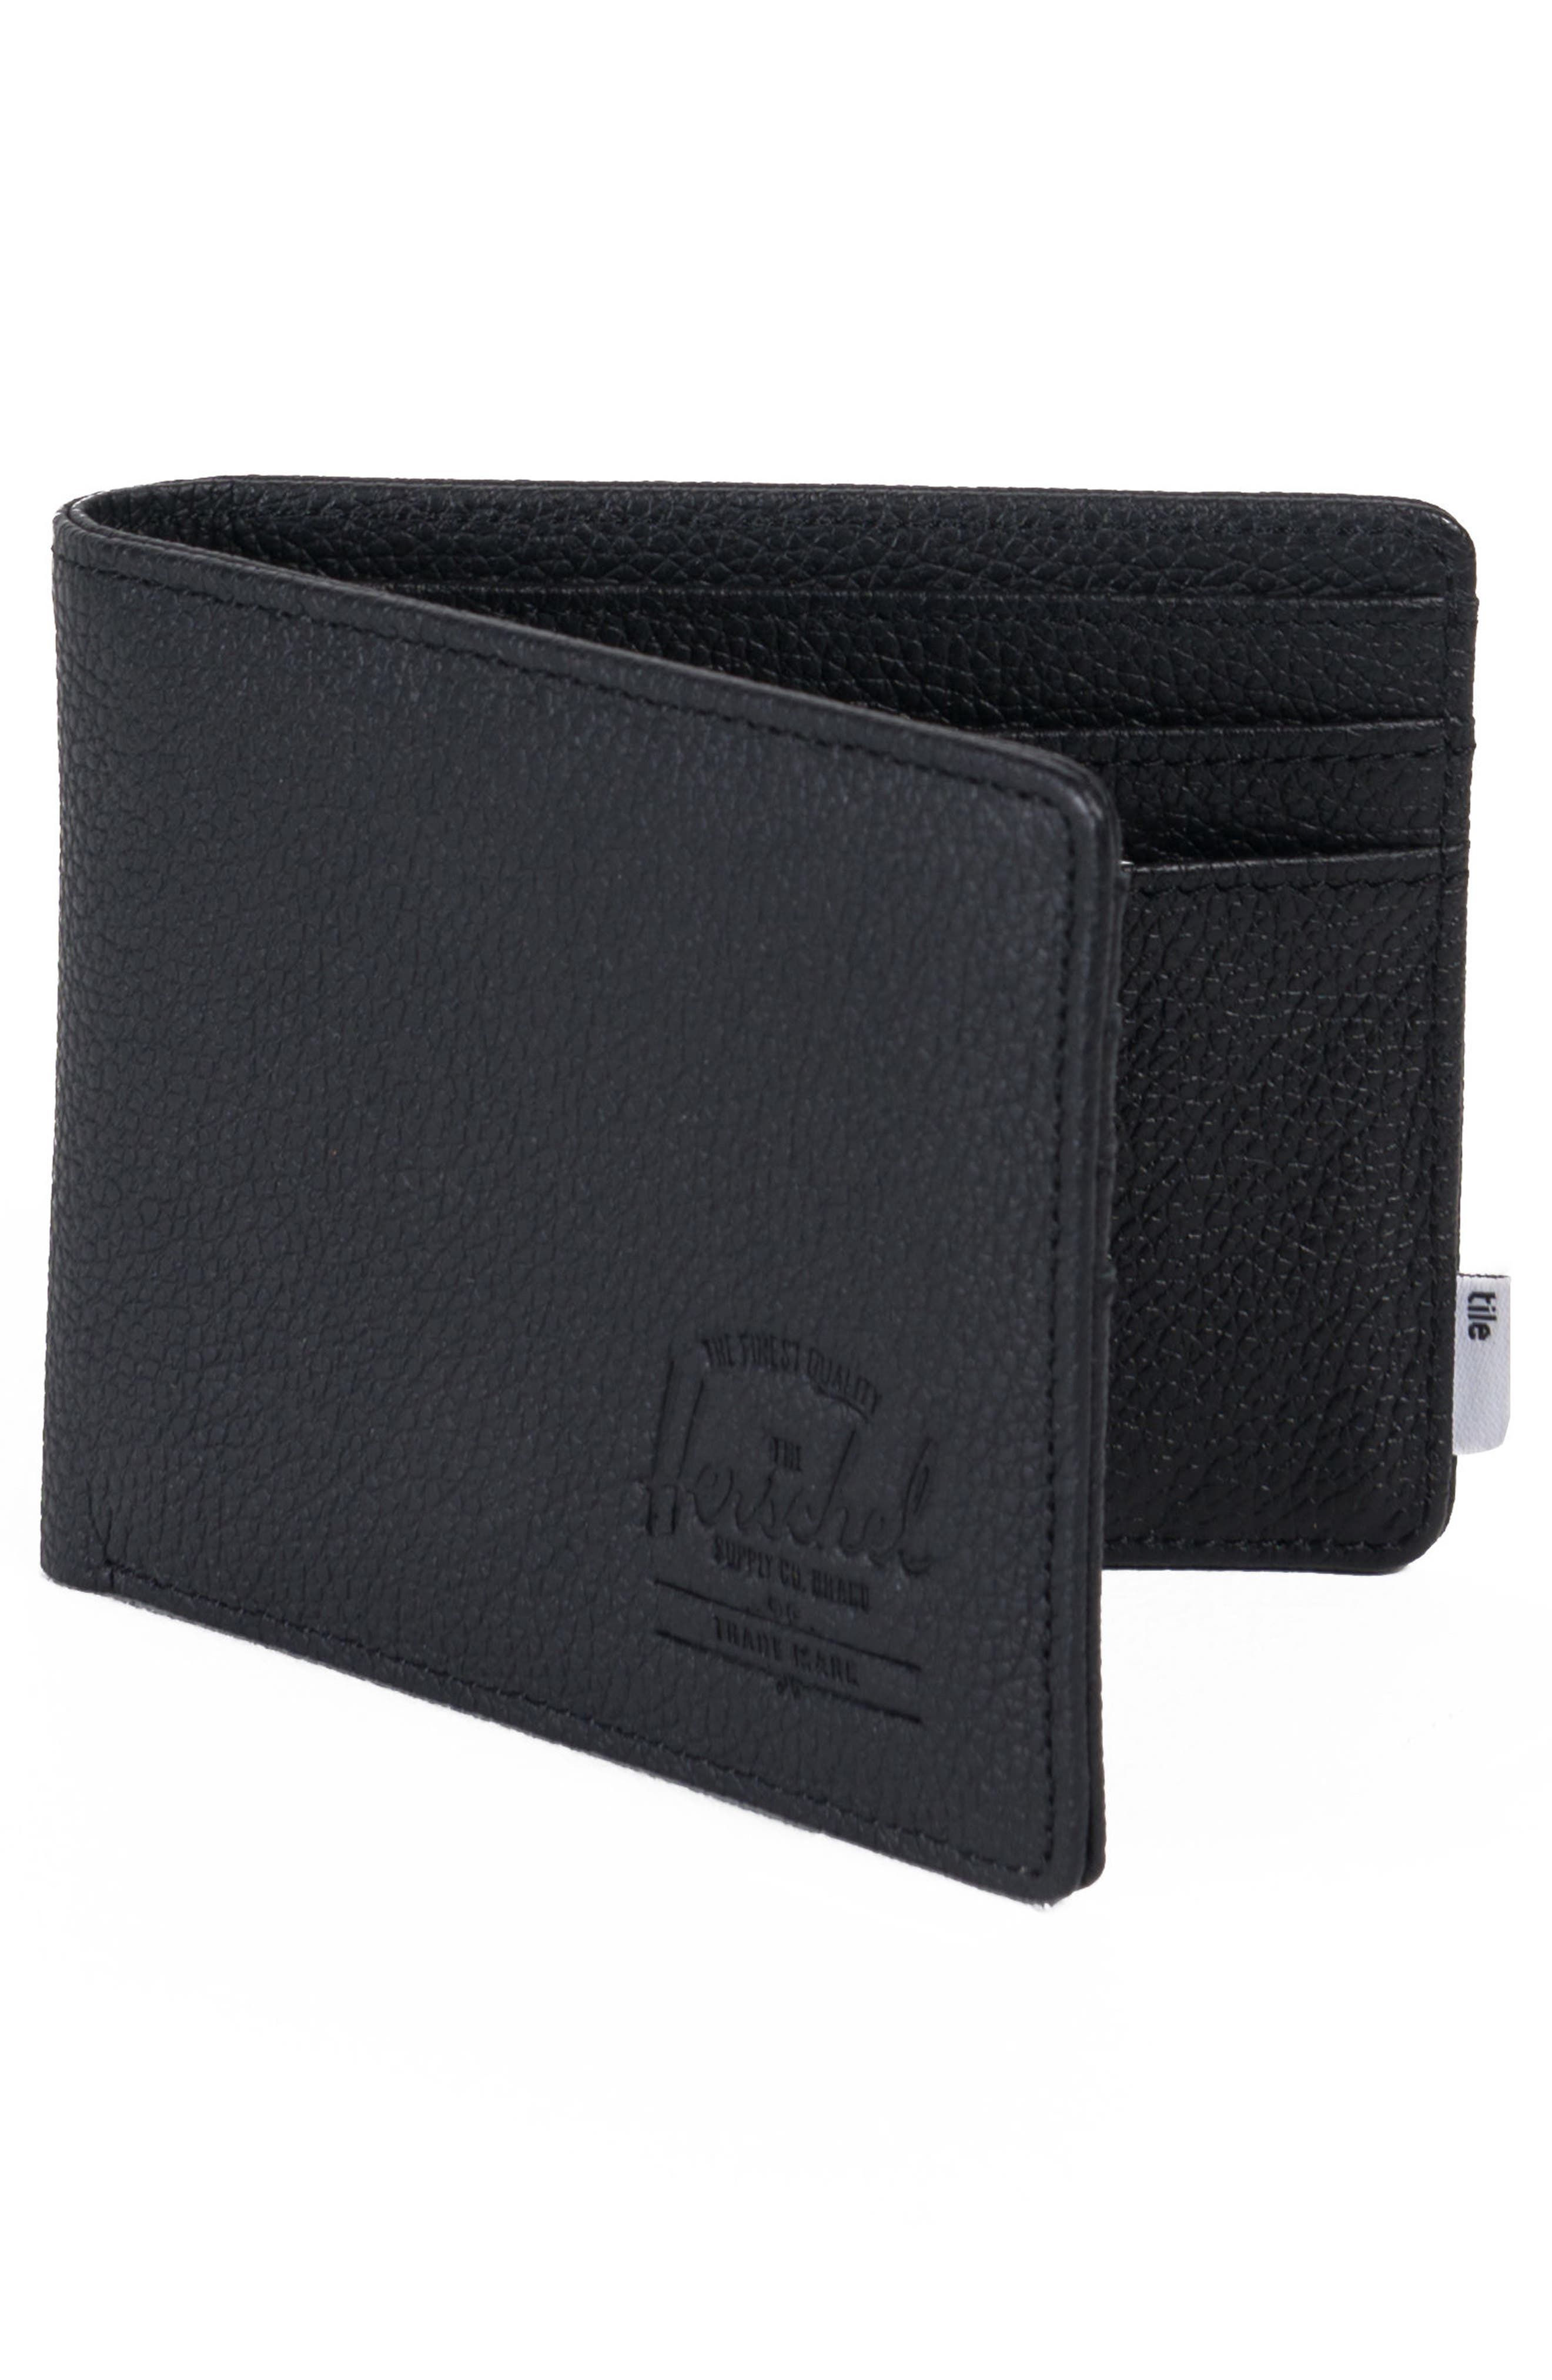 Tile Roy Leather Wallet,                             Alternate thumbnail 2, color,